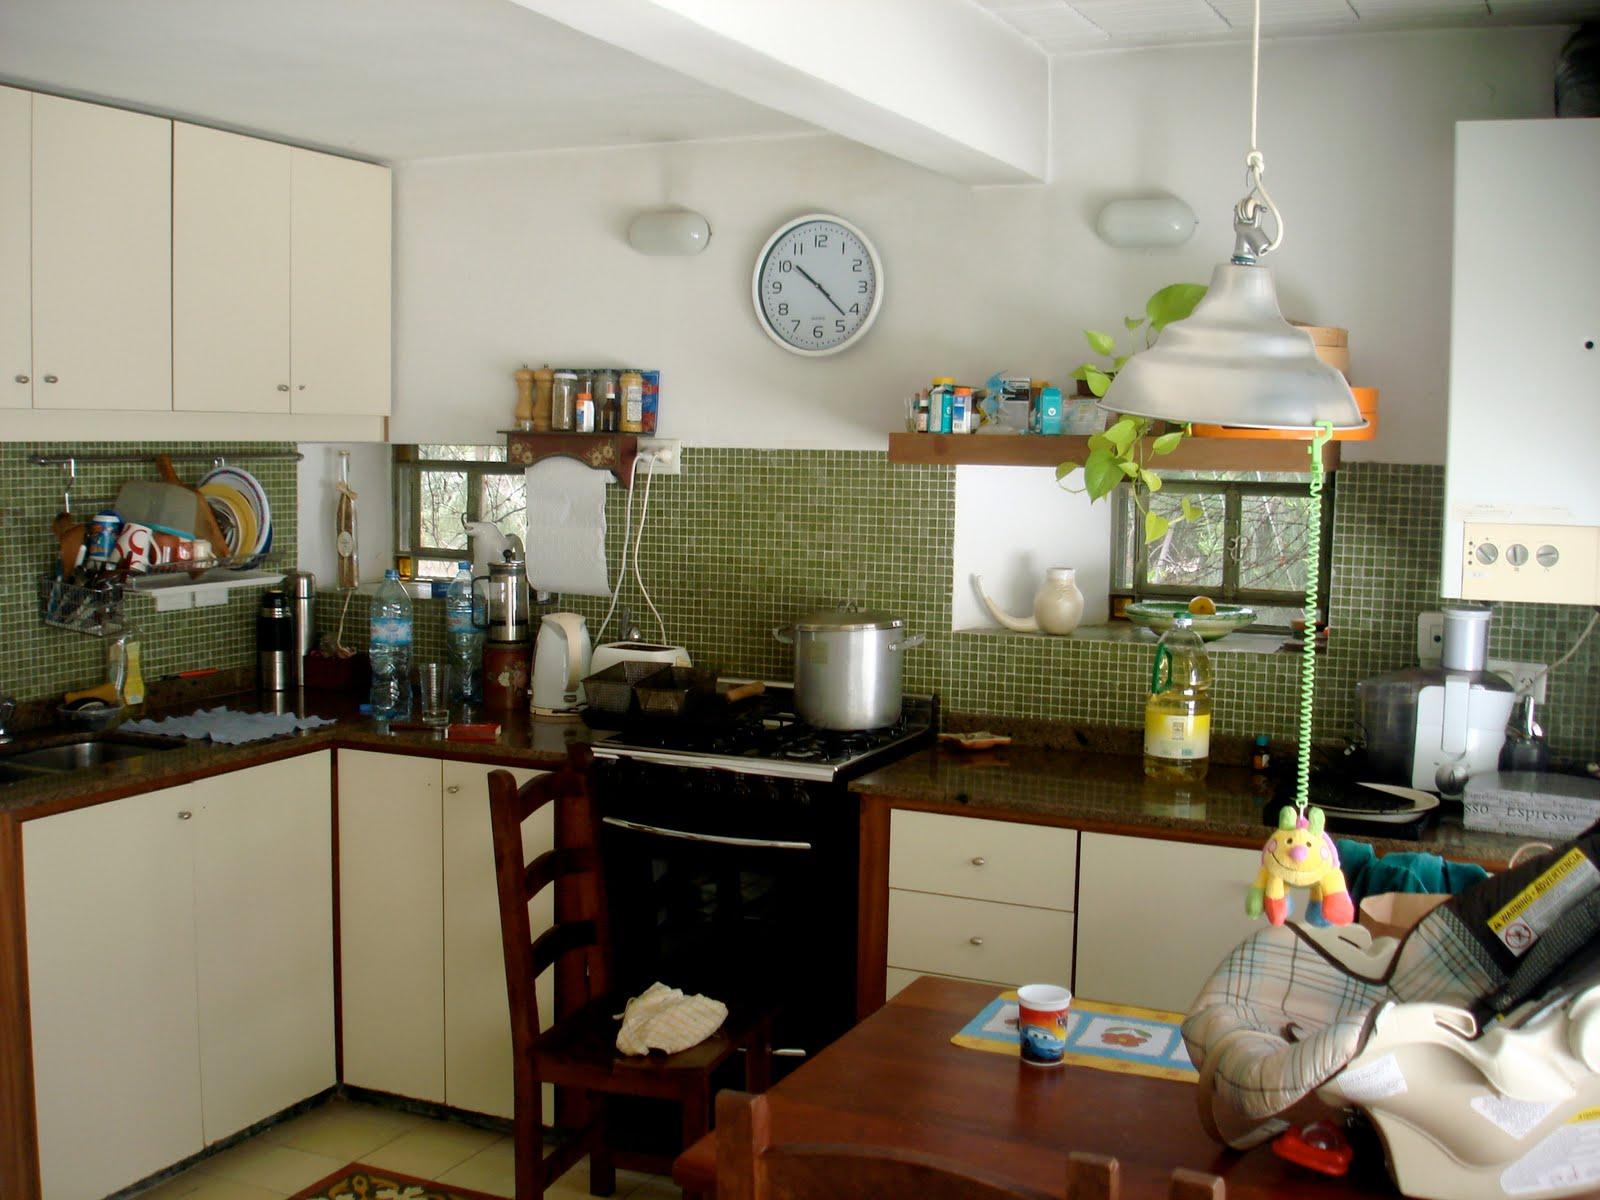 Ph hermoso en palermo soho la cocina for Cocinas super pequenas